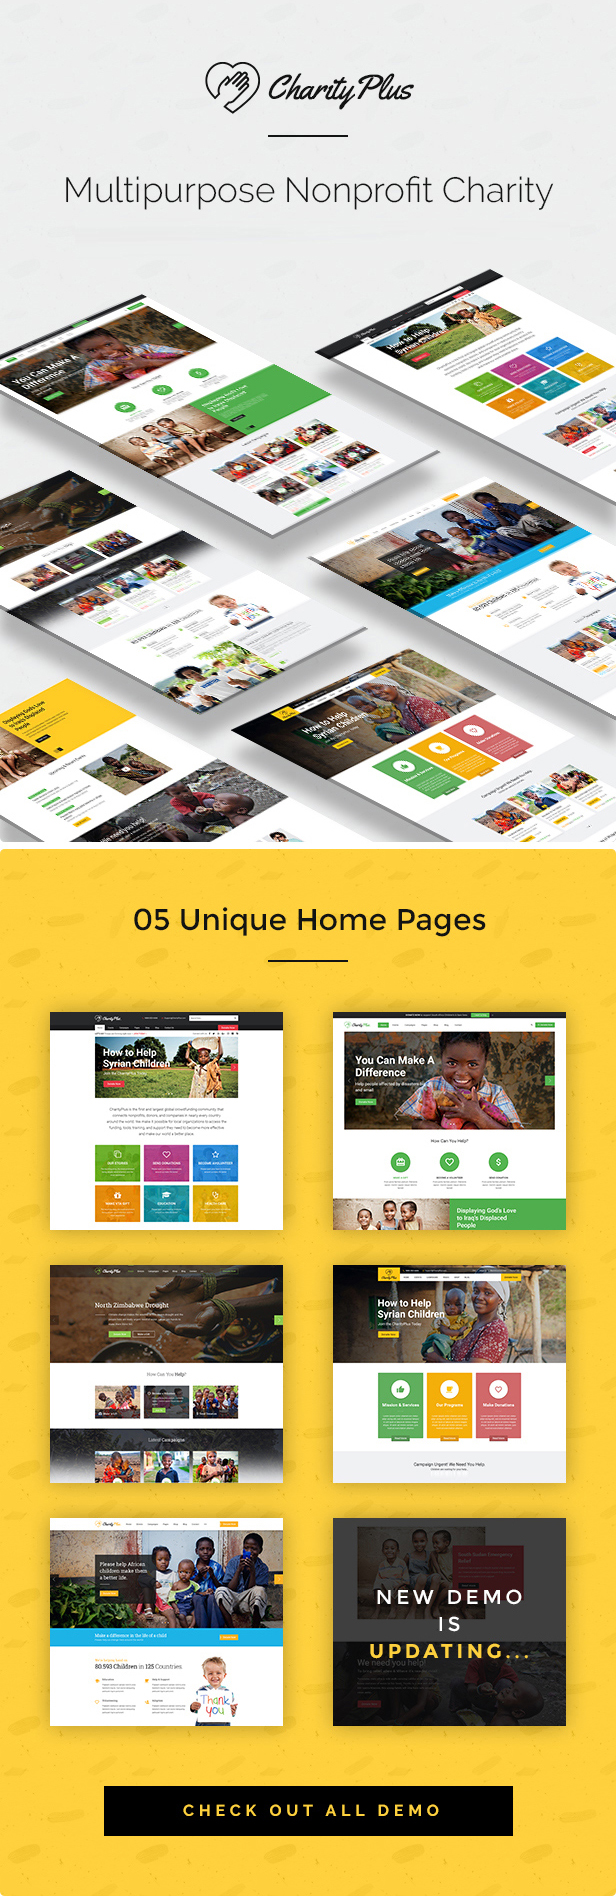 CharityPlus - Multipurpose Nonprofit Charity Organization HTML5 Template - 2